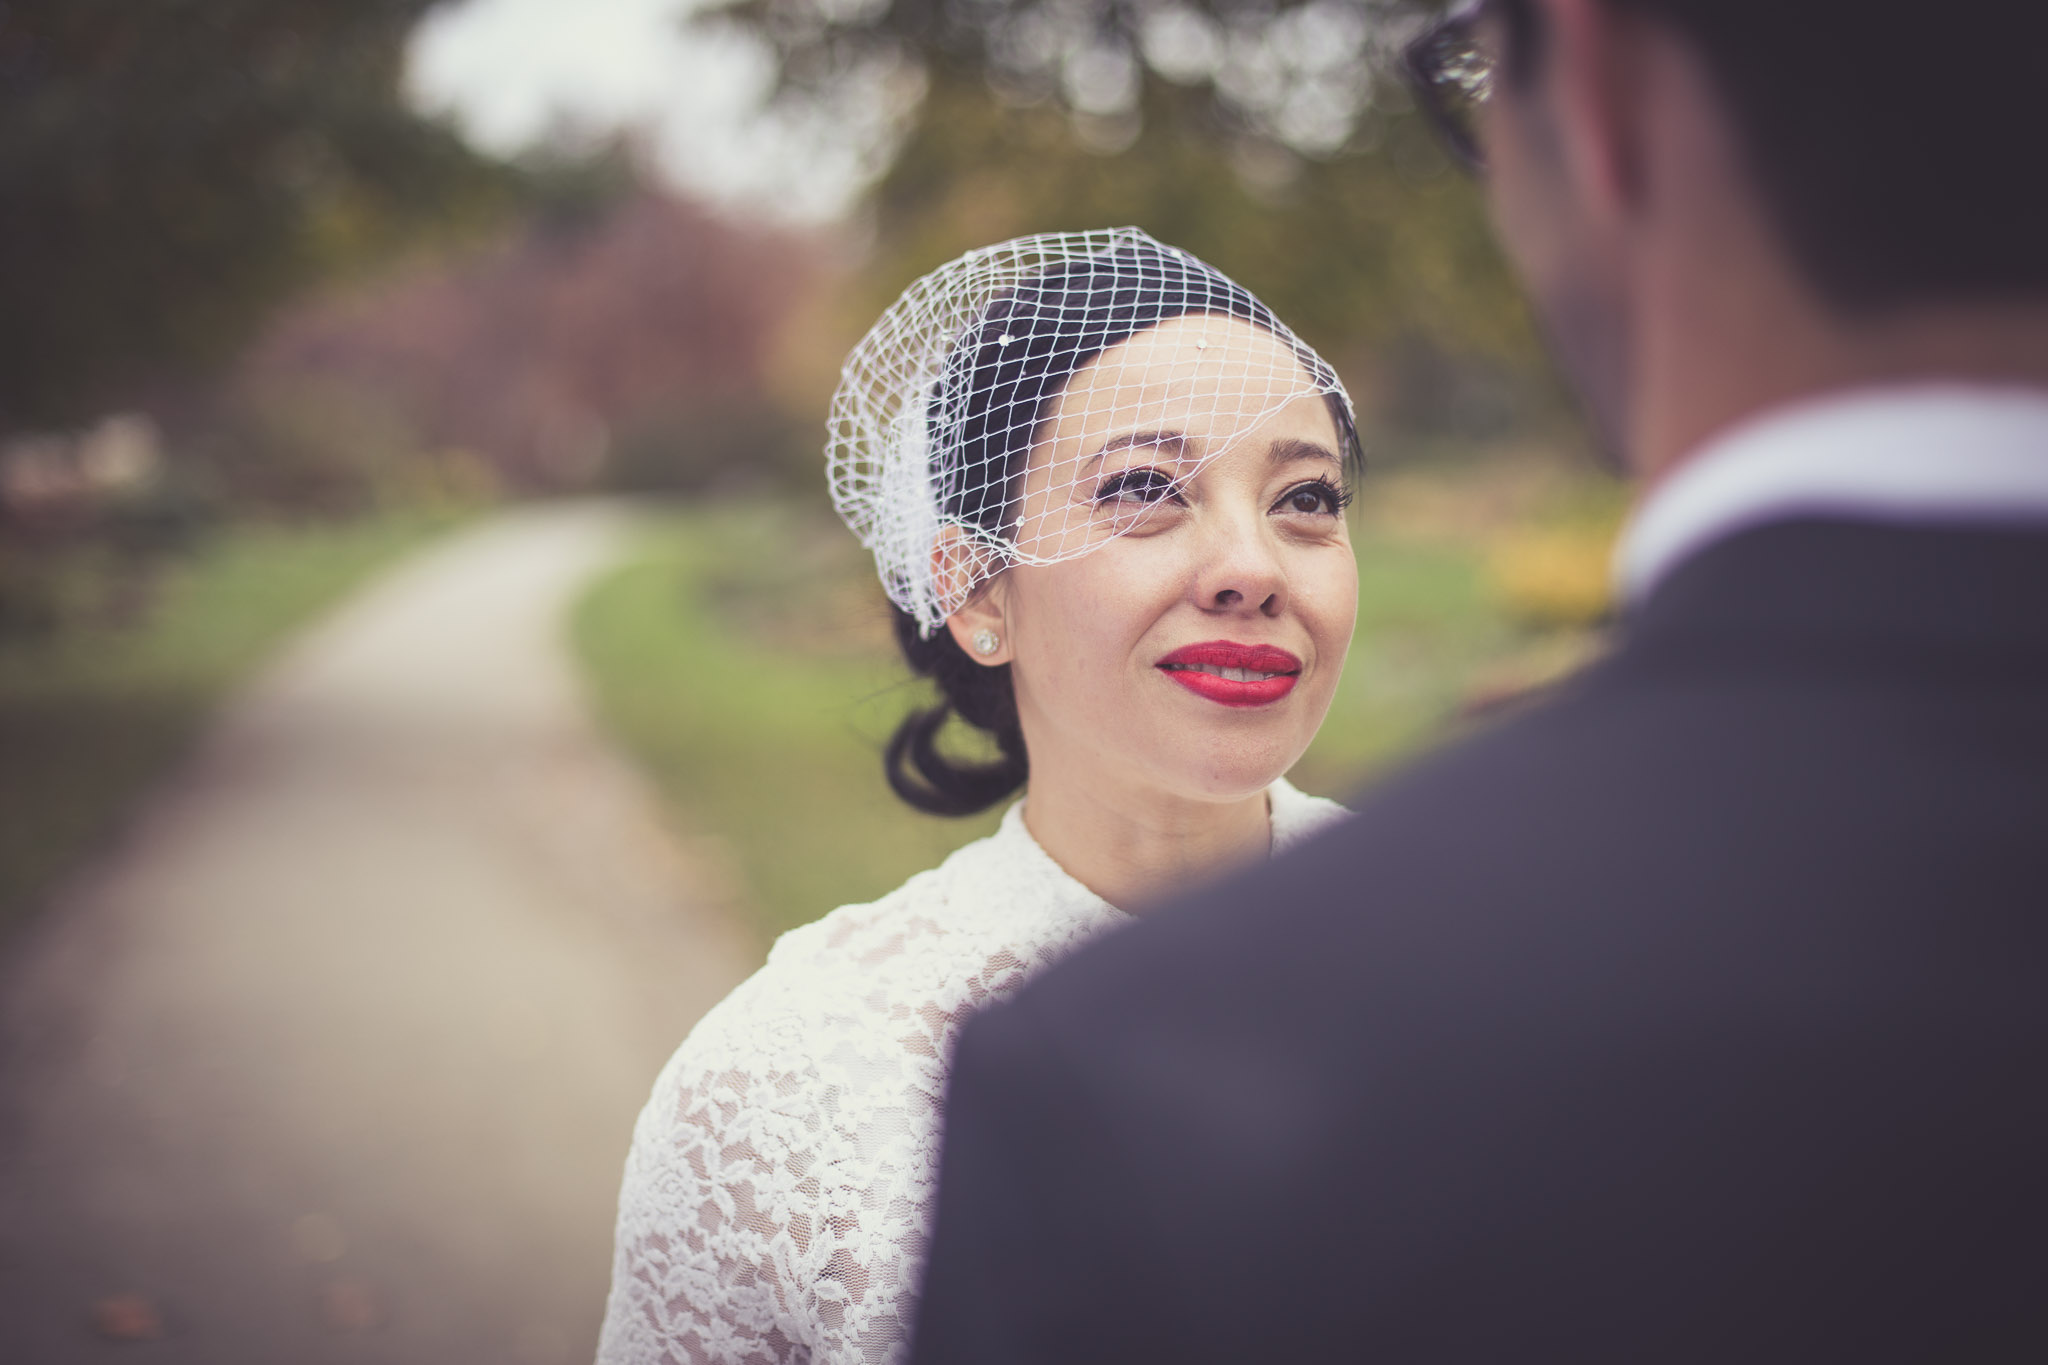 Geovanna-JP-wedding-shayne-gray-web-0820.jpg